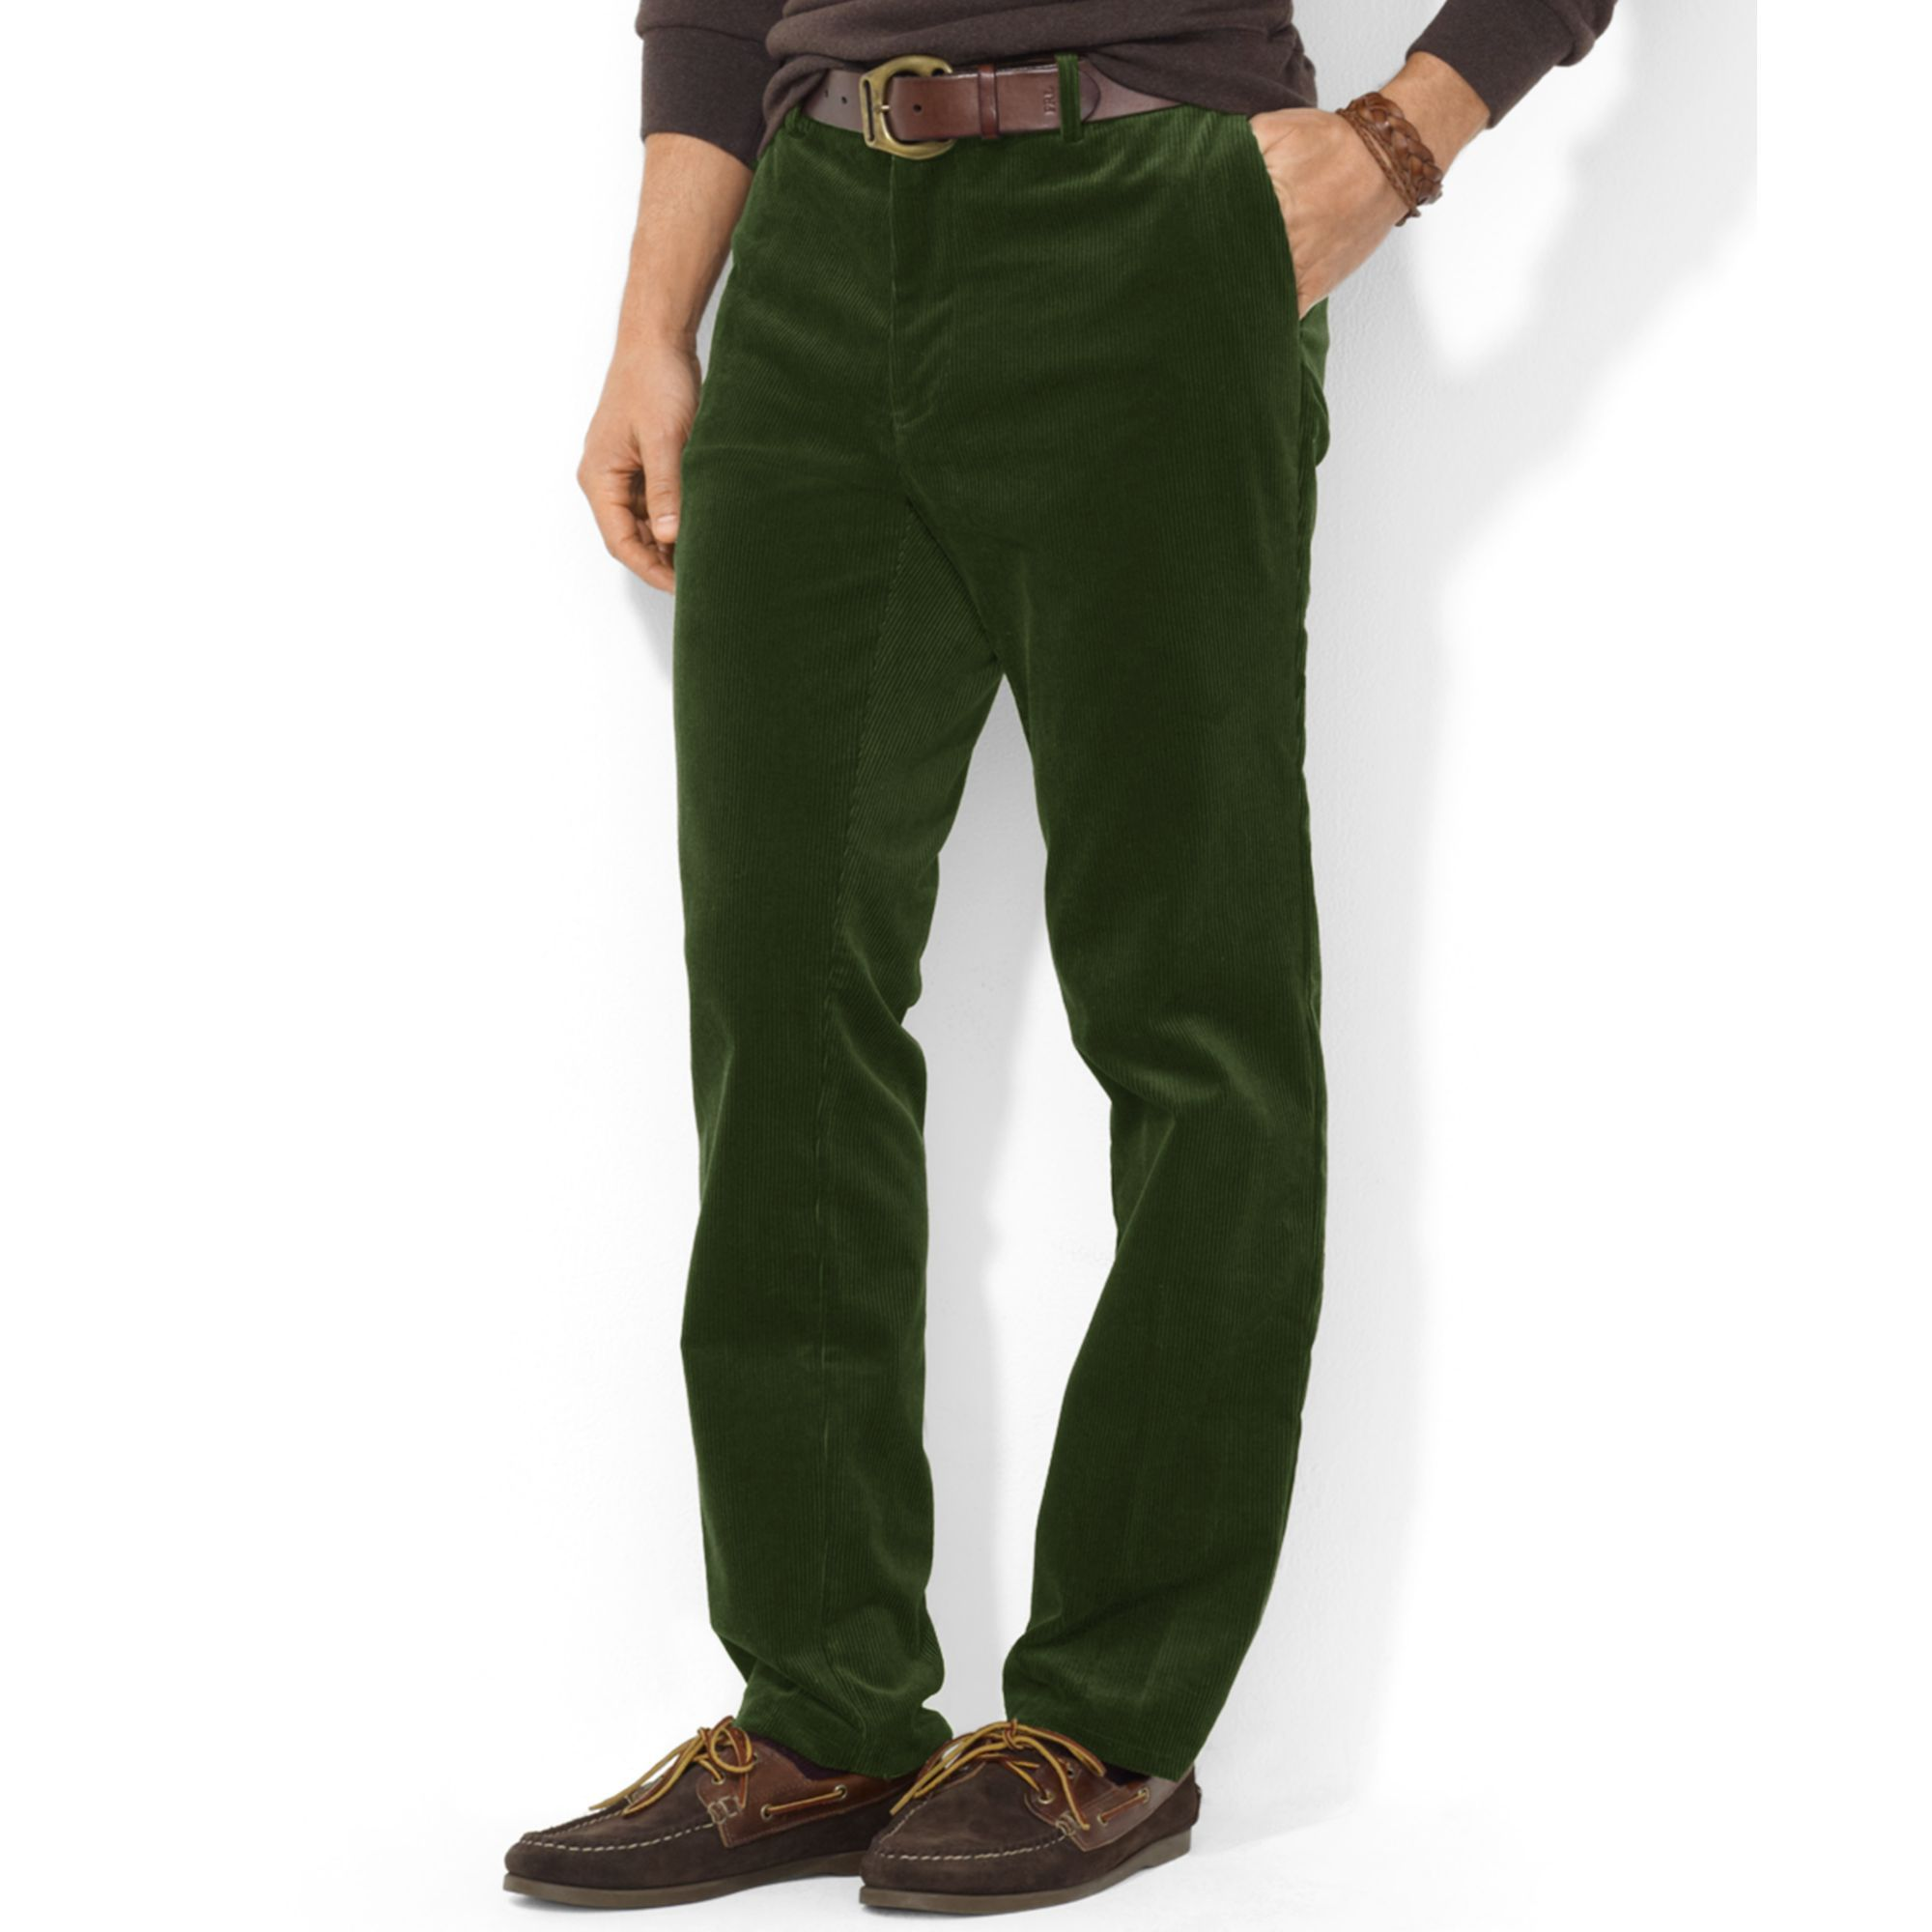 3293bccd2a5116 Polo Ralph Lauren Stretch Slim Fit Corduroy Pant